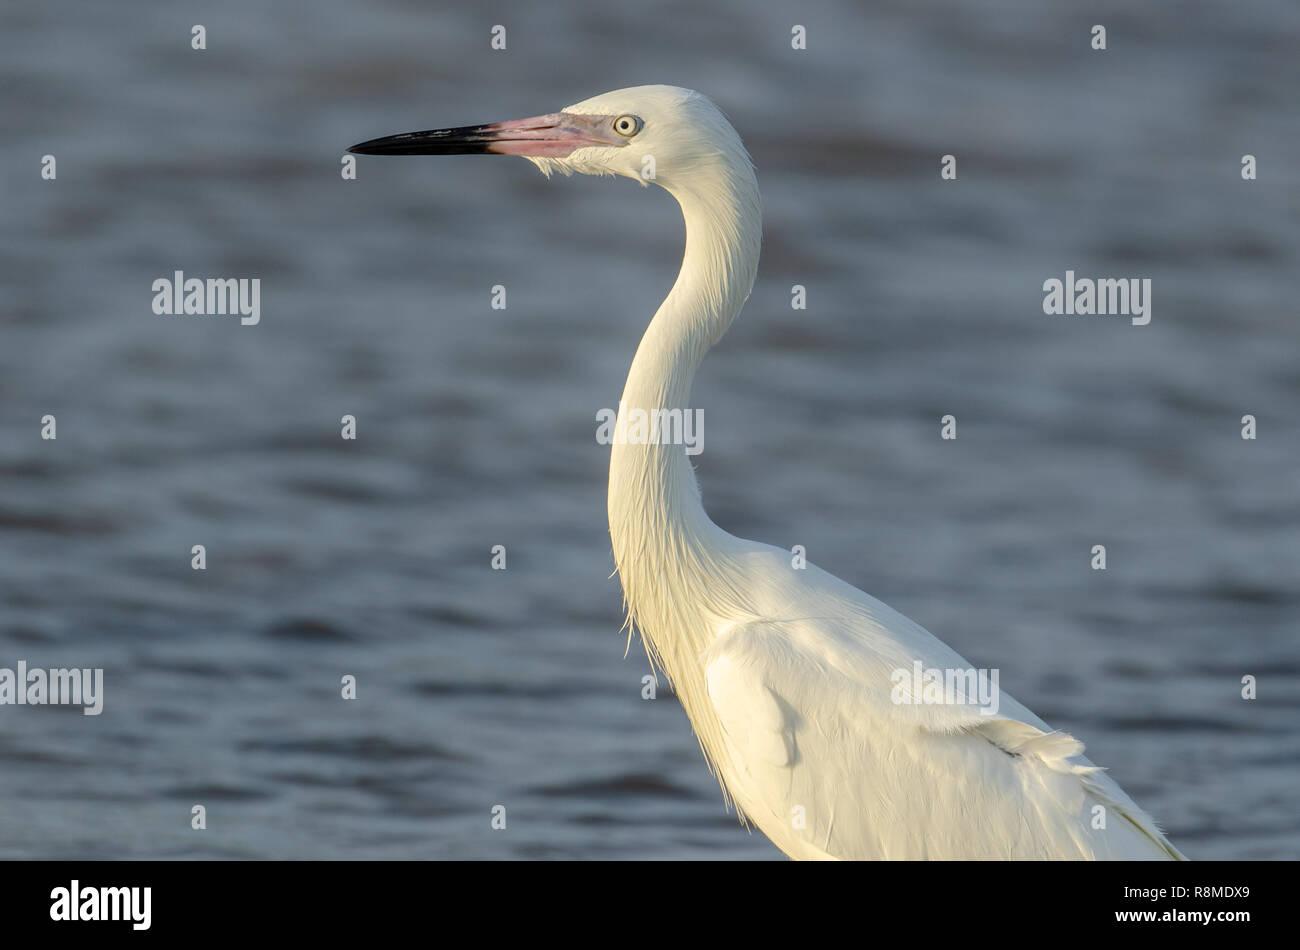 Near Threatened Reddish egret white morph (Egretta rufescens) in Florida's coastal area - Stock Image